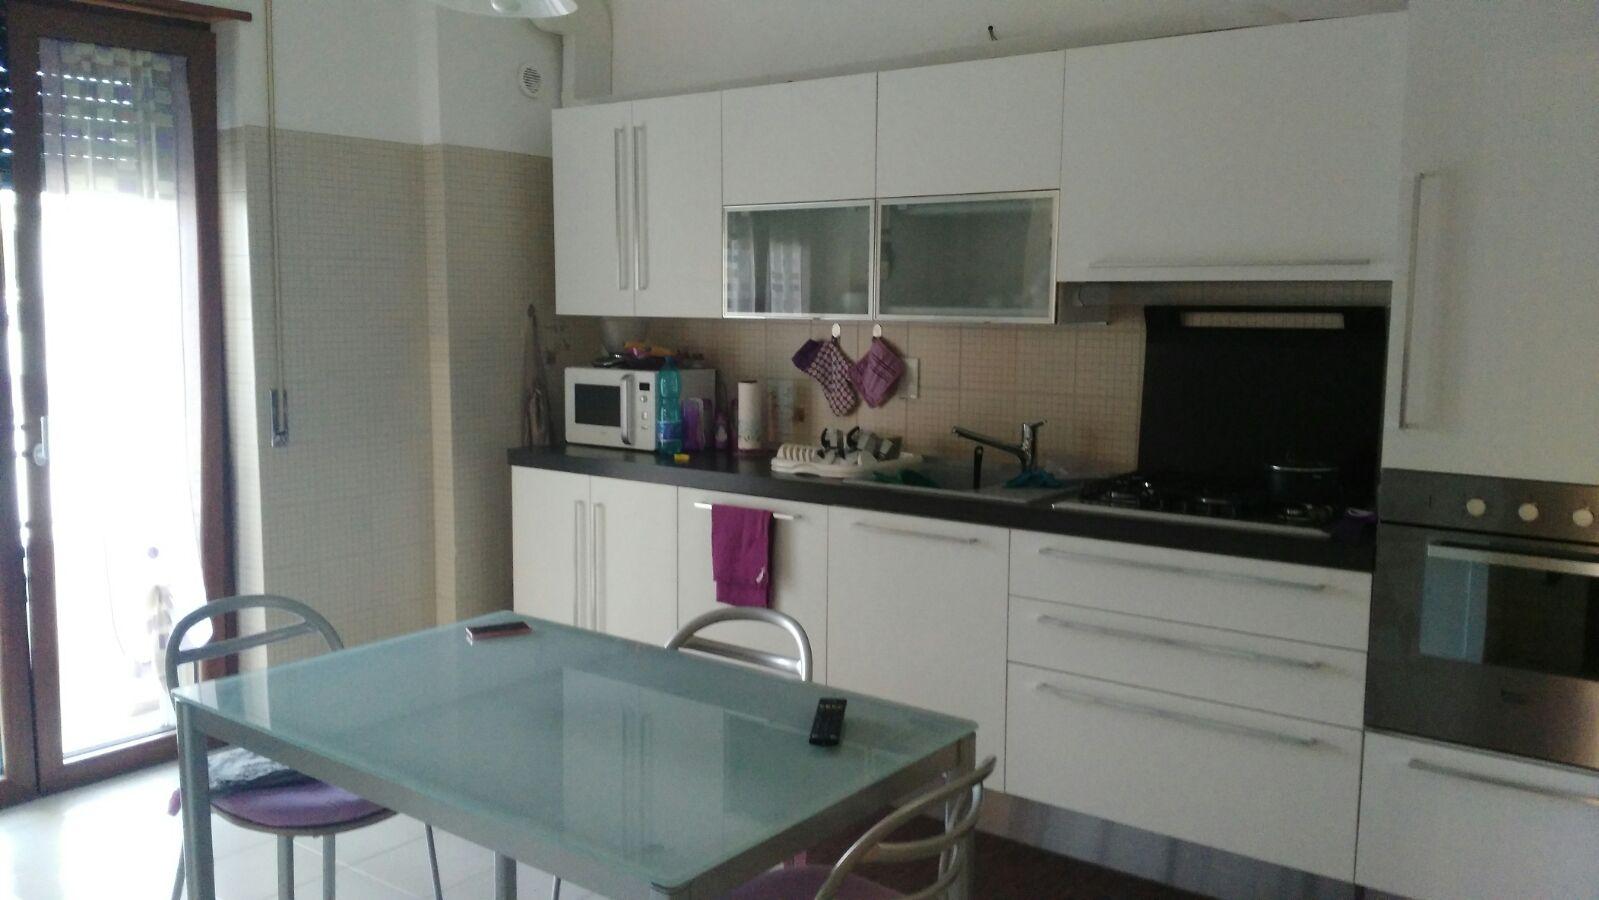 3 cucina abitabile 2 immobiliare giovine - Cucina abitabile ...